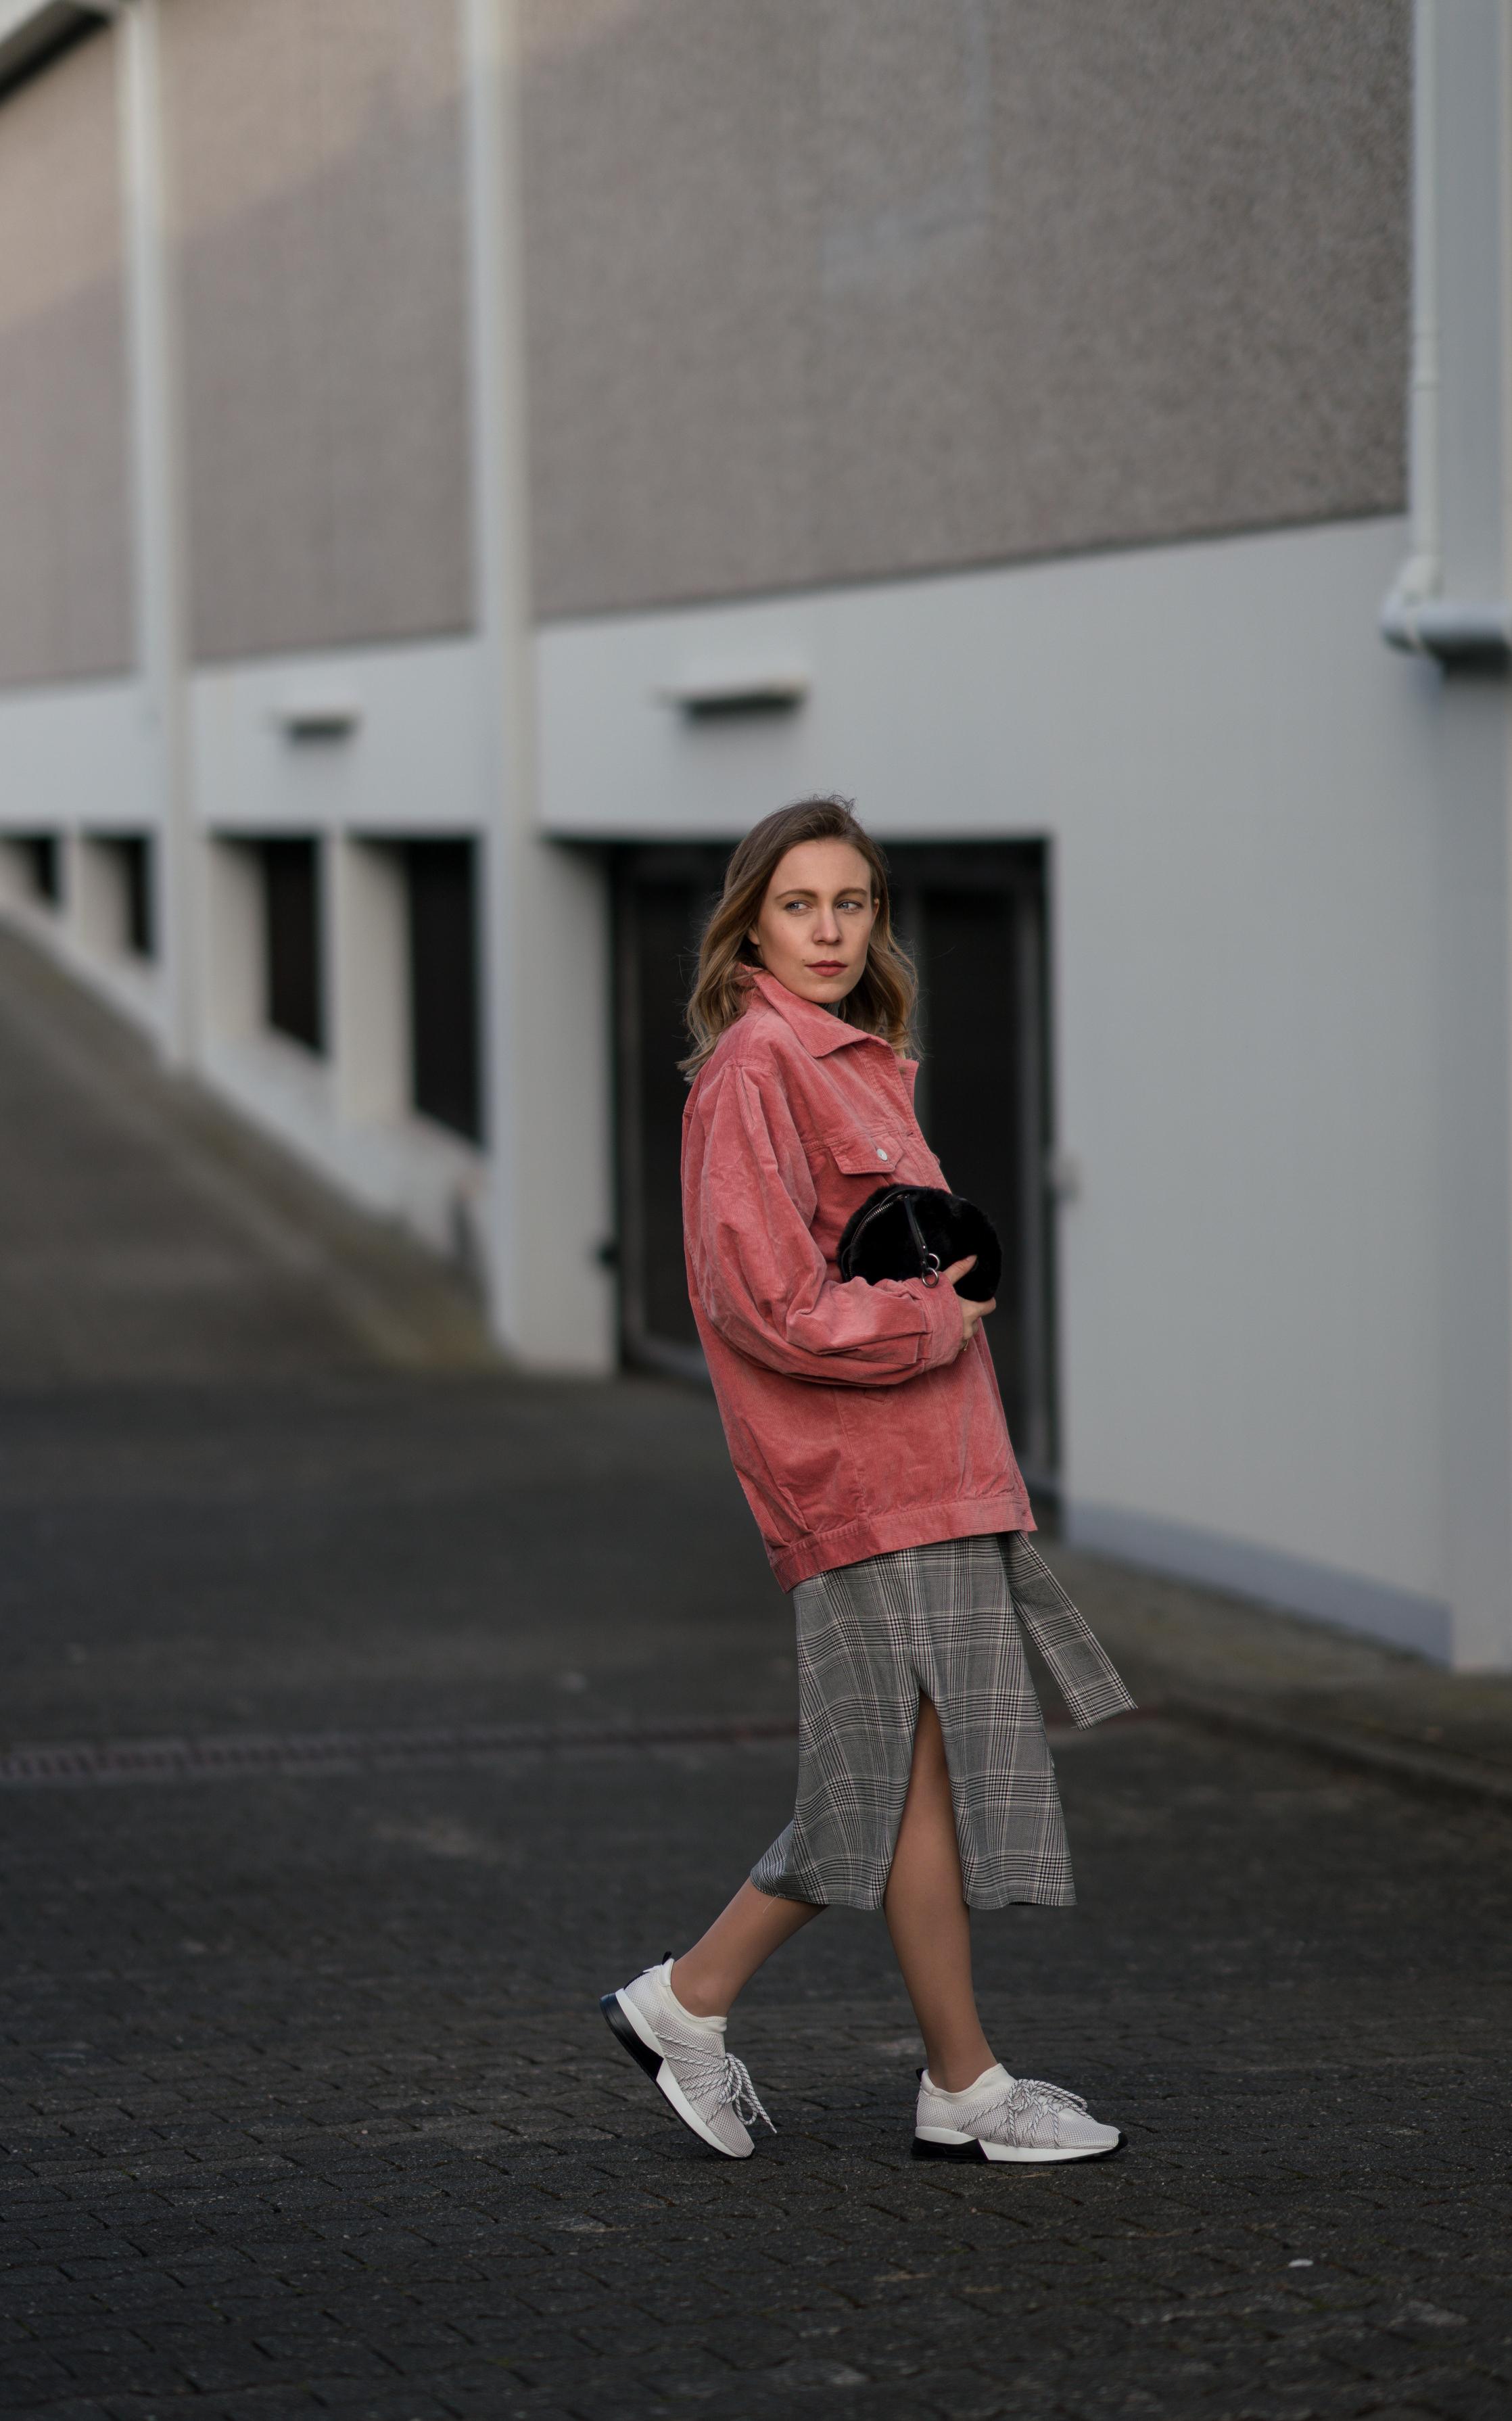 Pink Cord Jacket Glencheck Dress White Sneakers oversize Mango Cordjacke kariertes Kleid Zara Cord Trend Streetstyle Modeblog Sariety Fashionblogger Heidelberg_6